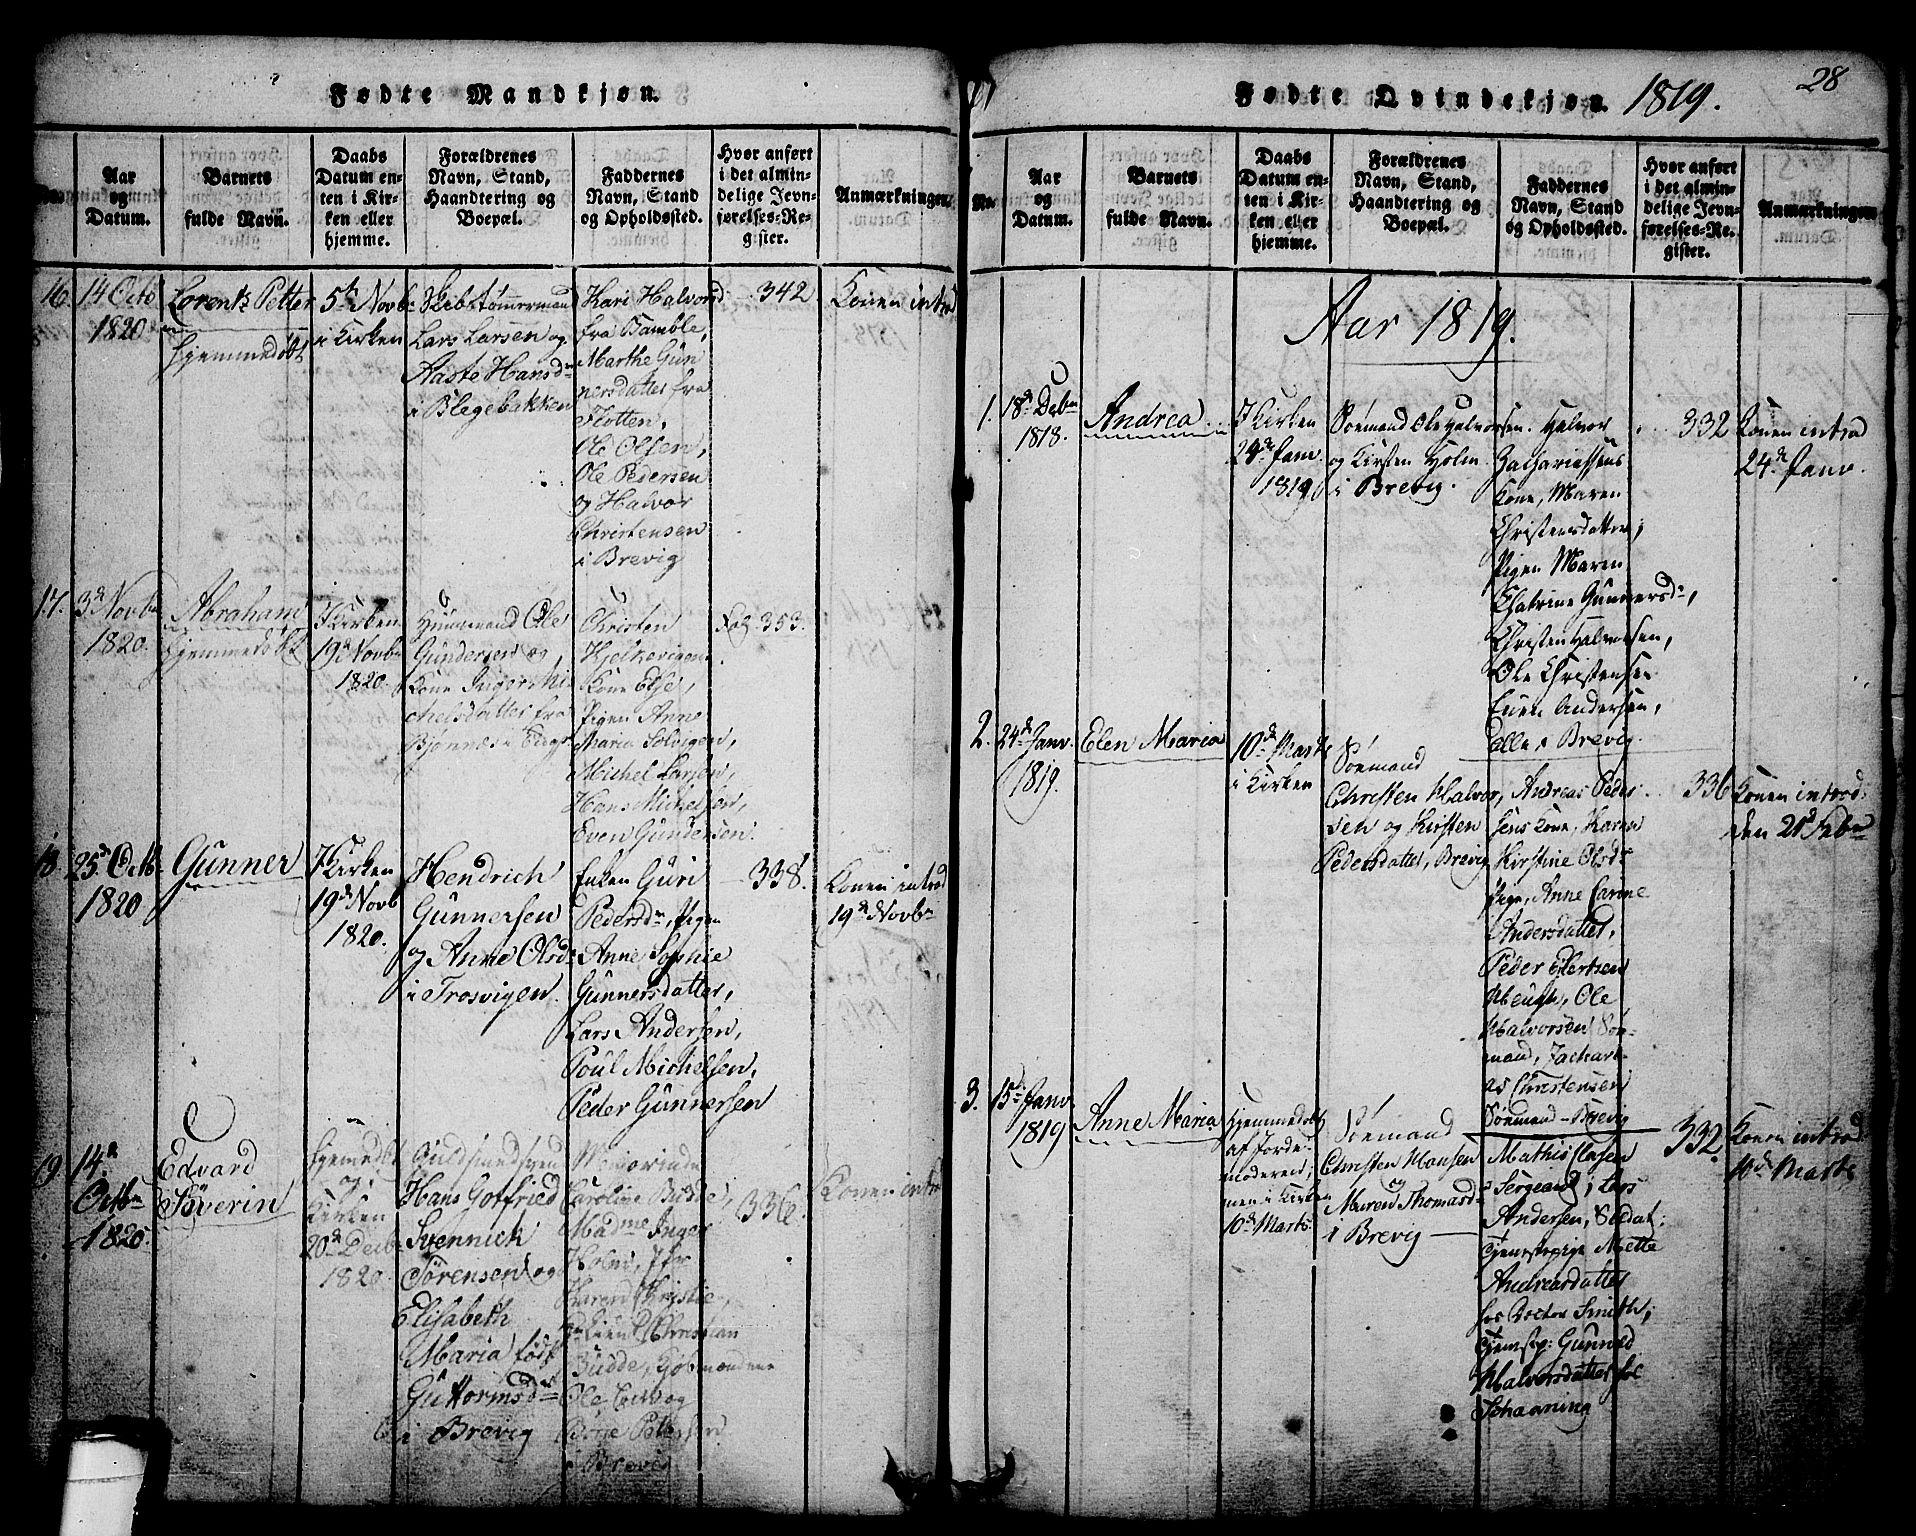 SAKO, Brevik kirkebøker, G/Ga/L0001: Klokkerbok nr. 1, 1814-1845, s. 28